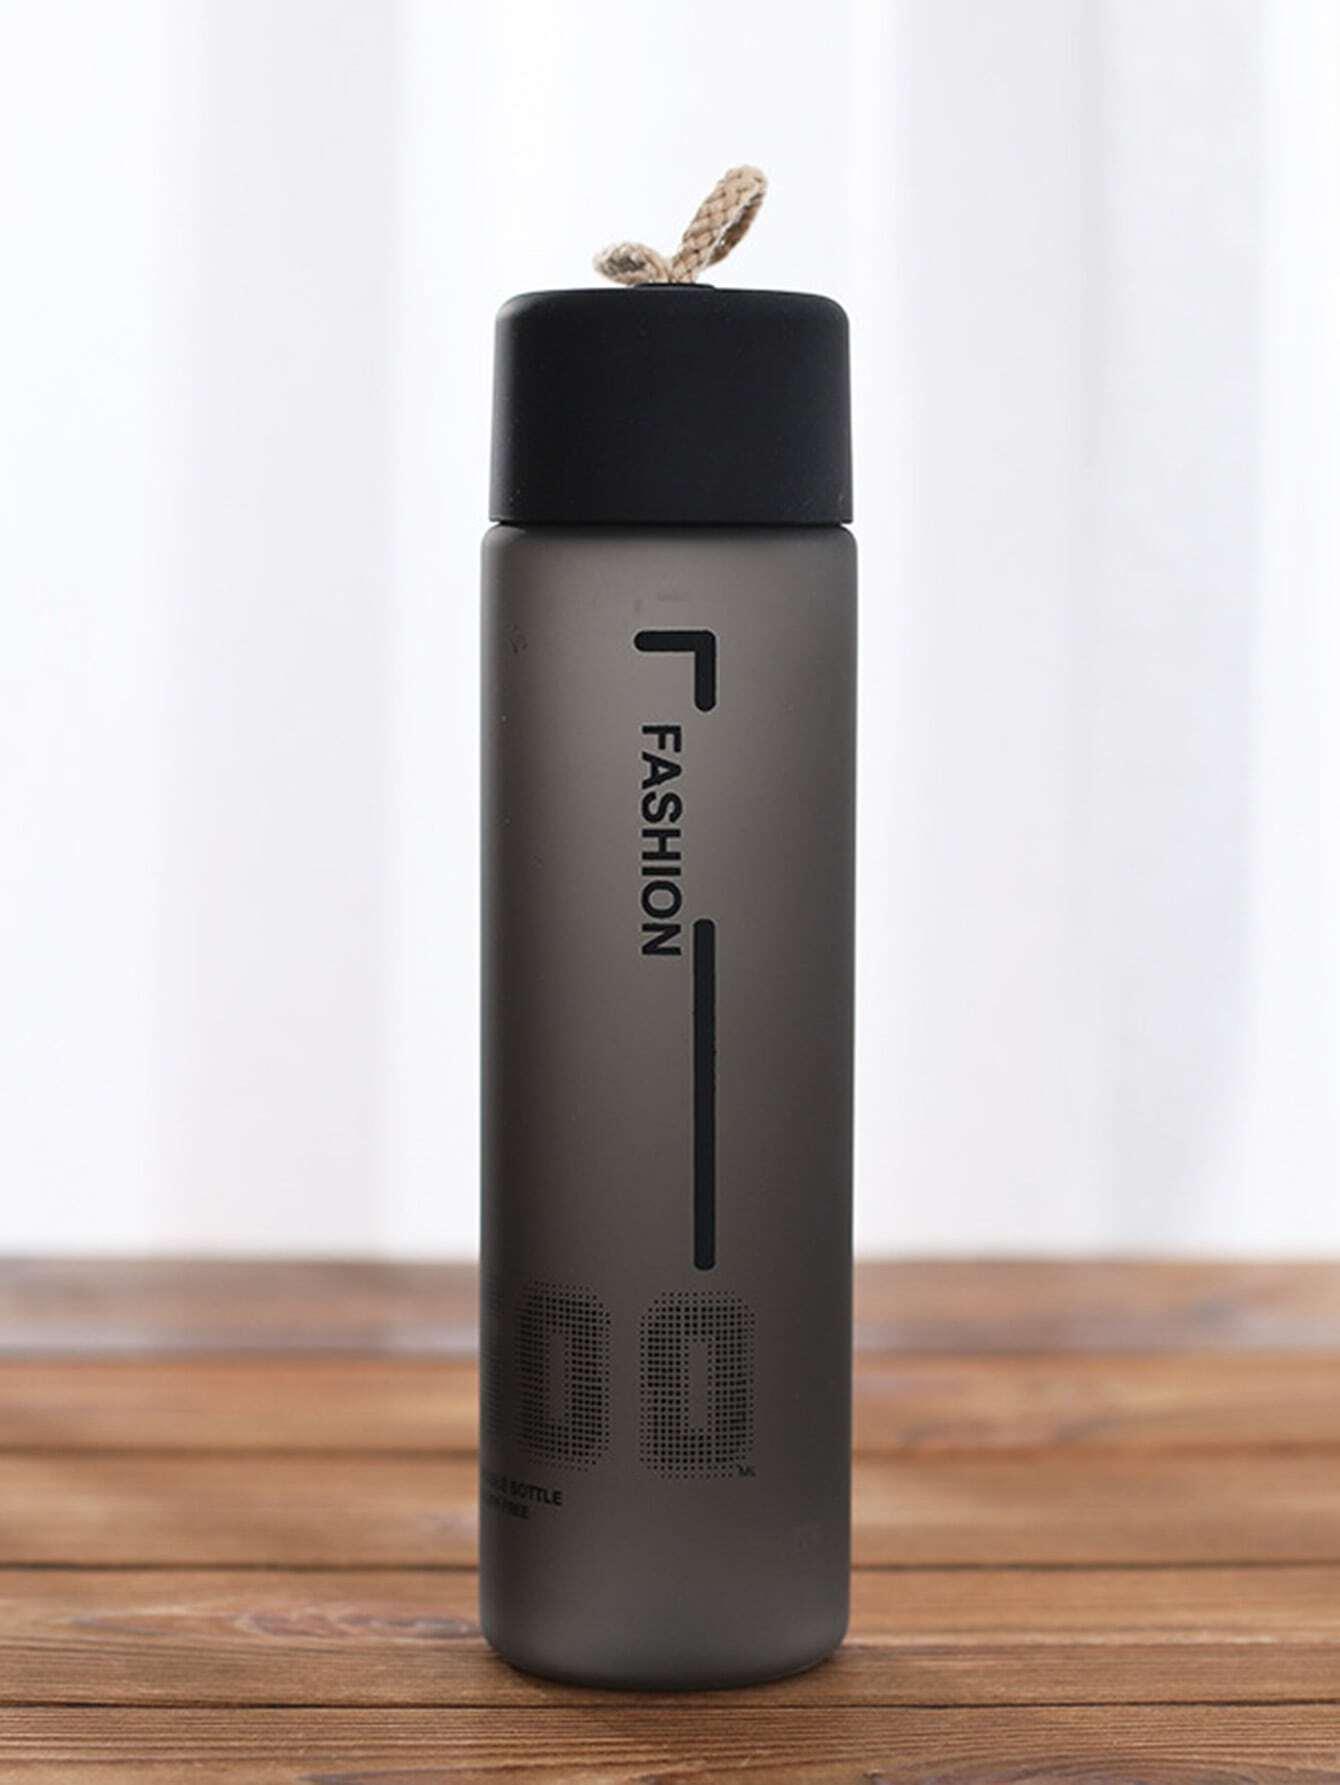 Slogan Print Water Bottle 500ml 500ml hydrogen rich cup generator alkaline water maker portable health bottle high concentration hydrogen water usb